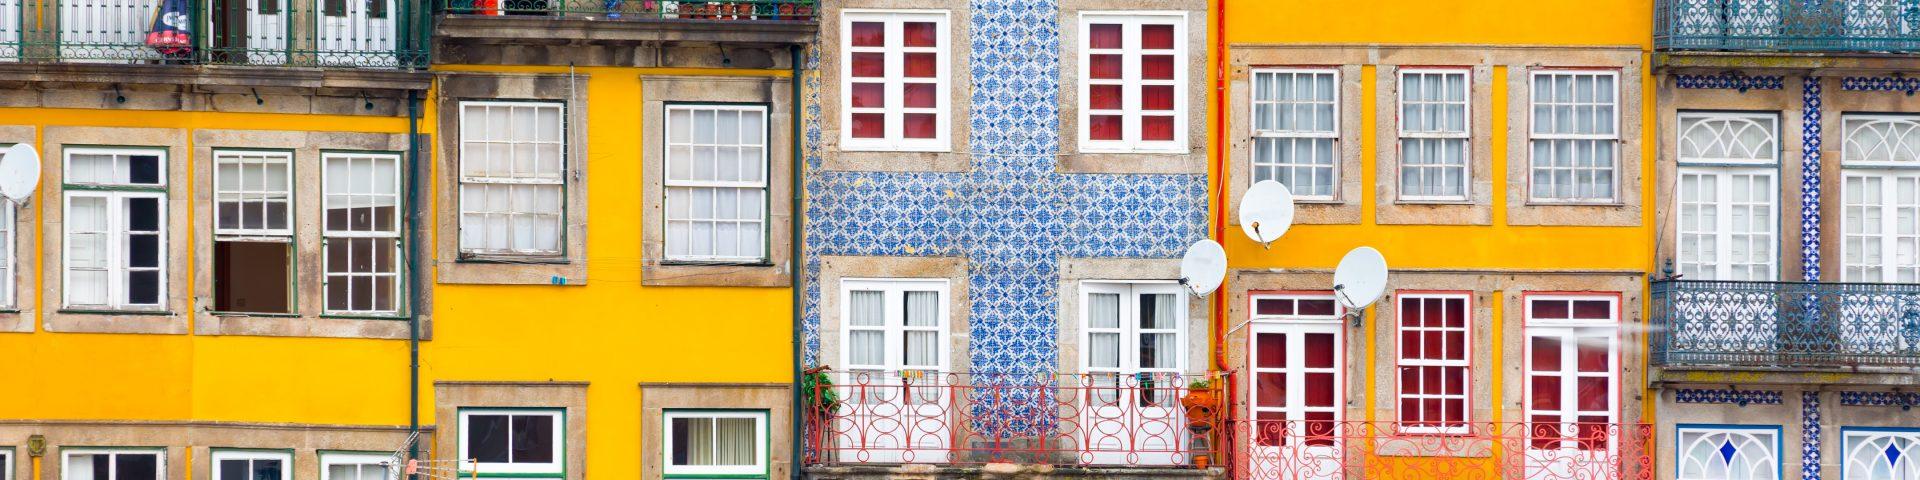 arquitectura de casas no porto no rio Douro